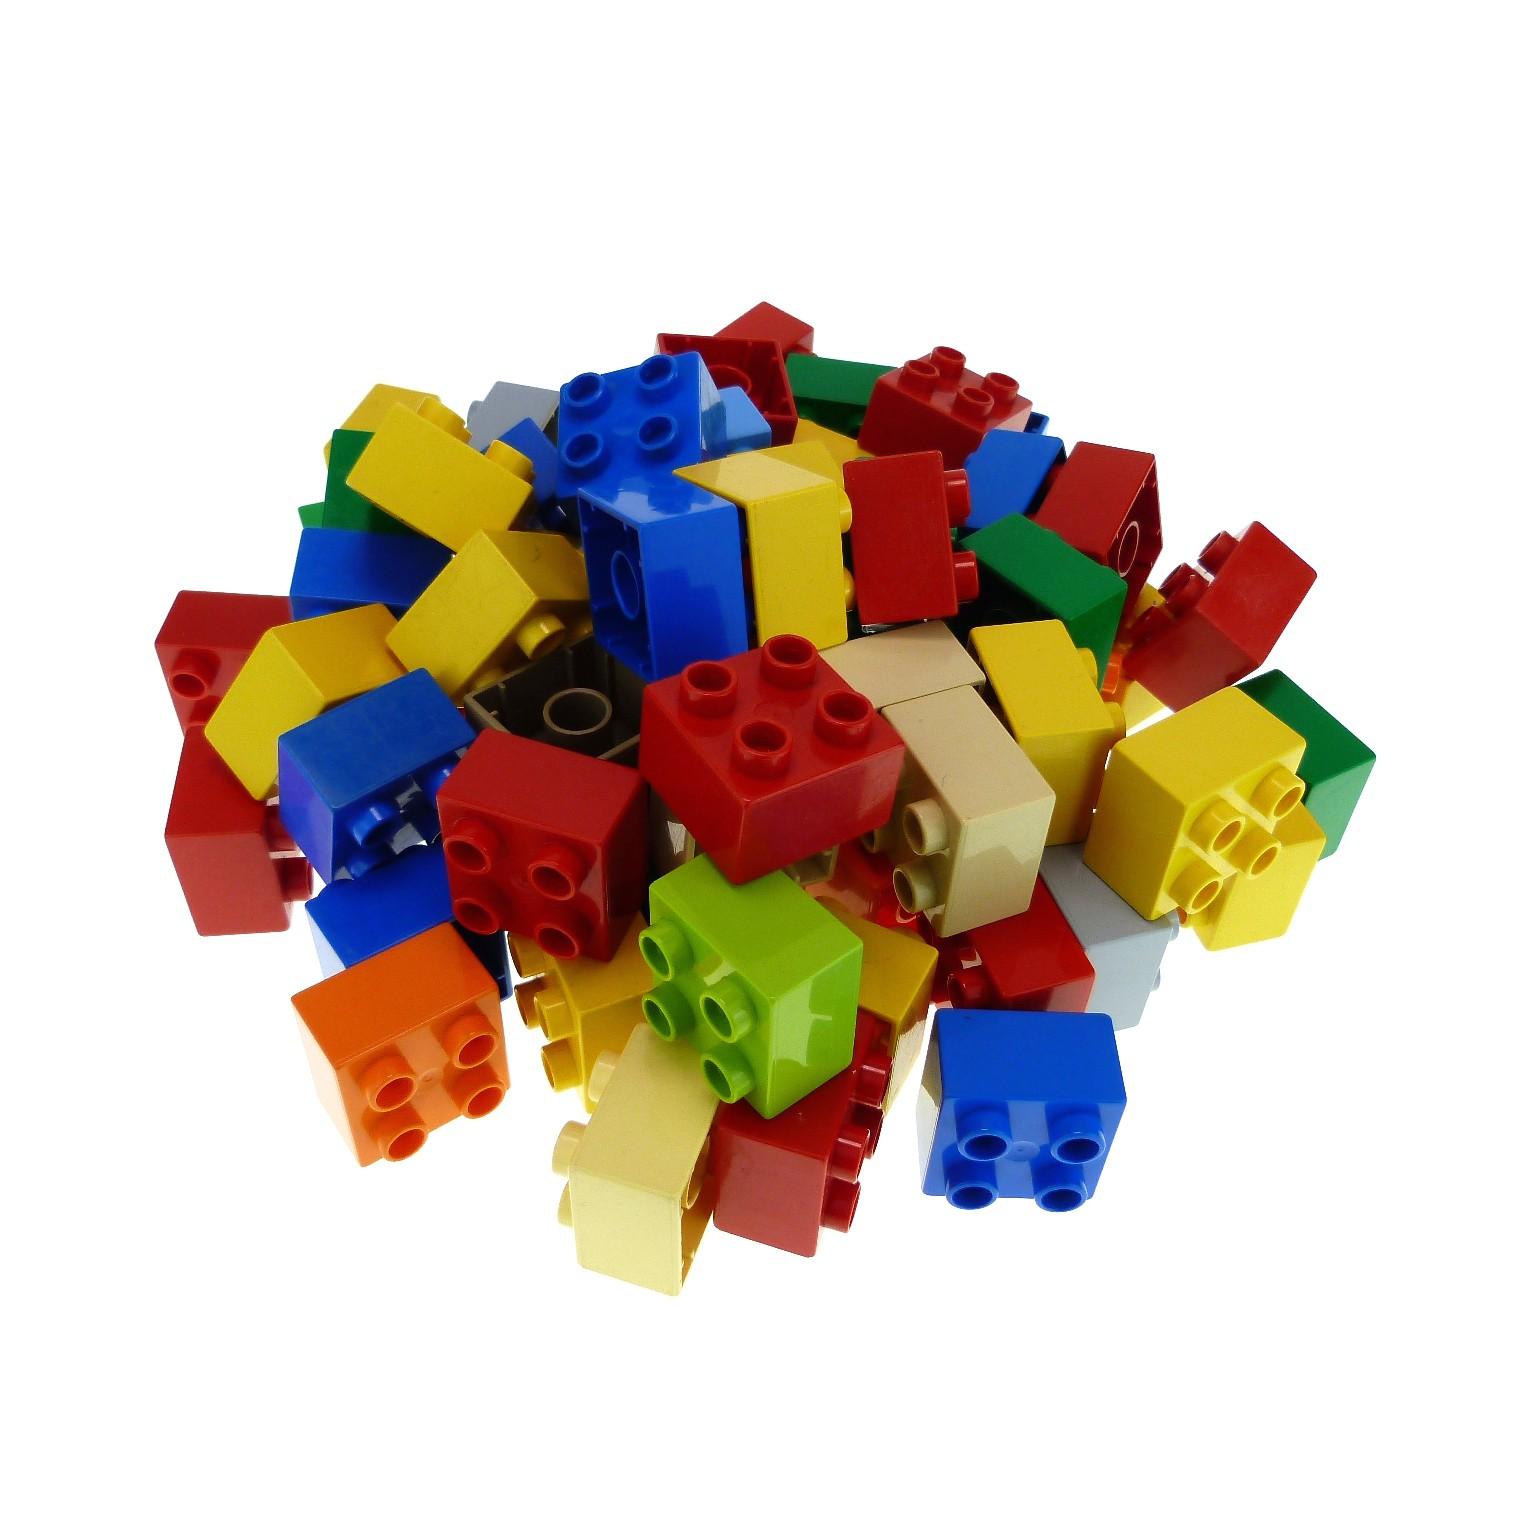 70 teile lego duplo 4er basic bausteine kiloware kg steine 2x2